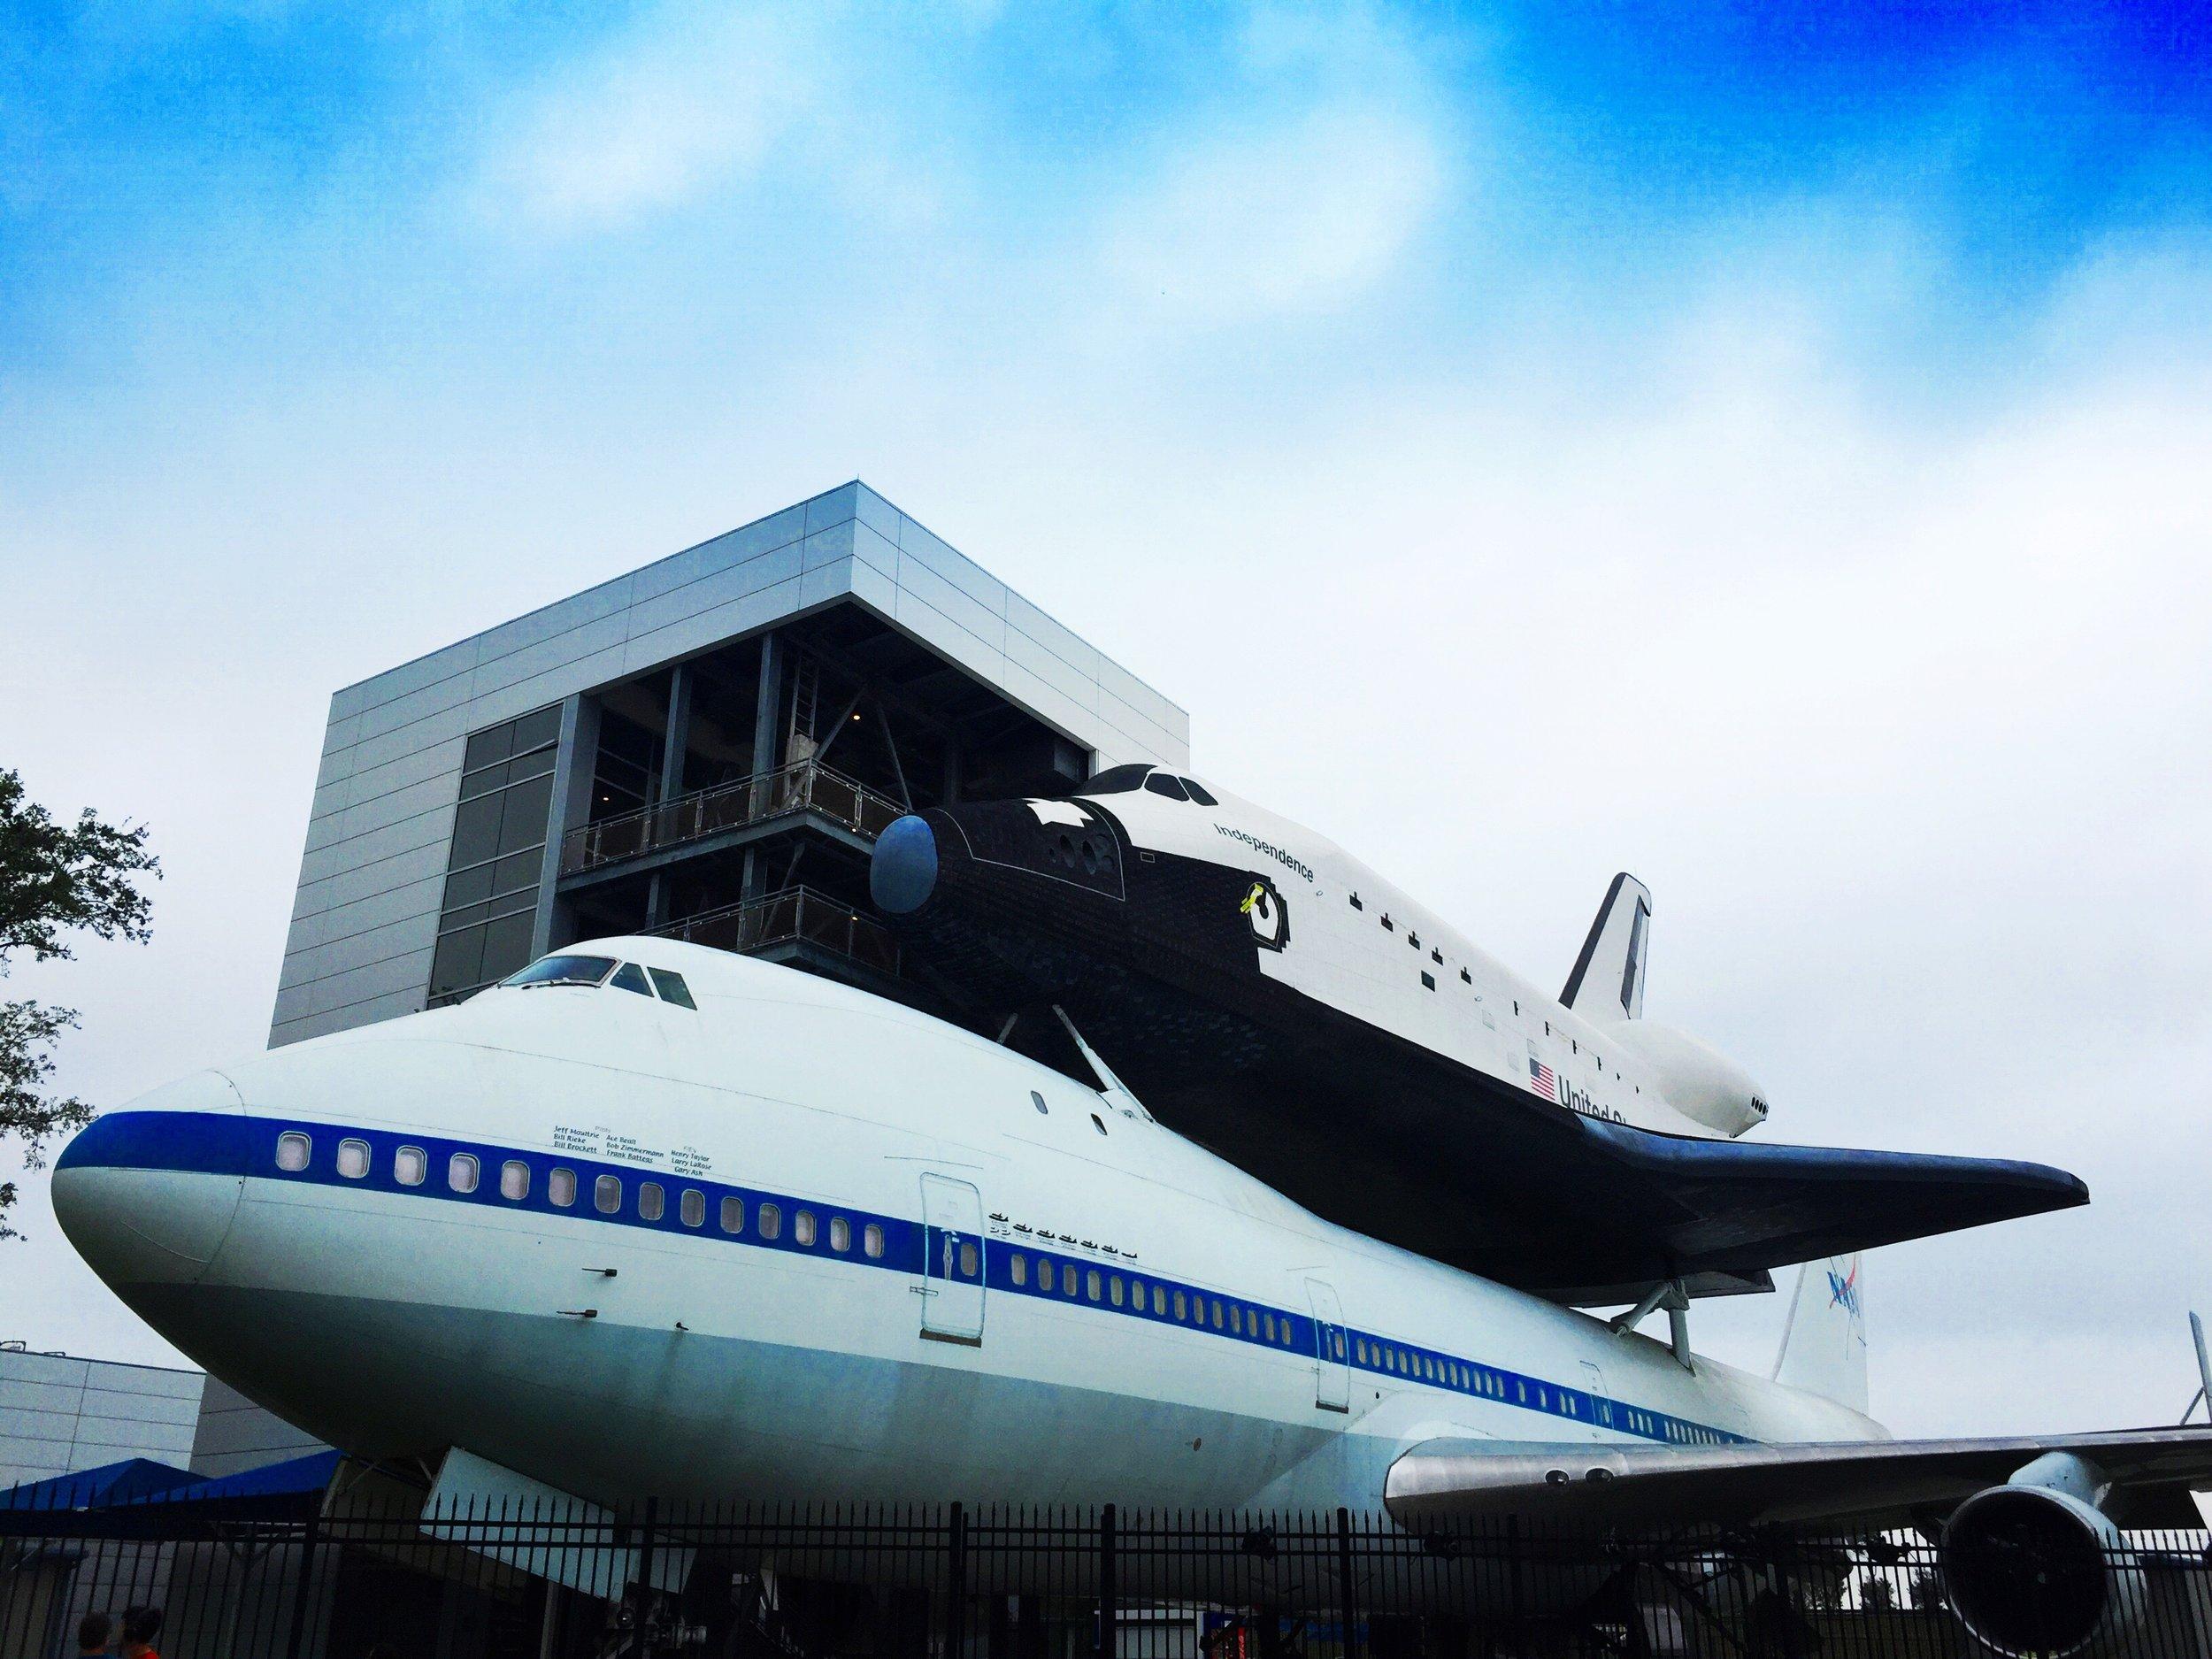 nasa houston space center exterior